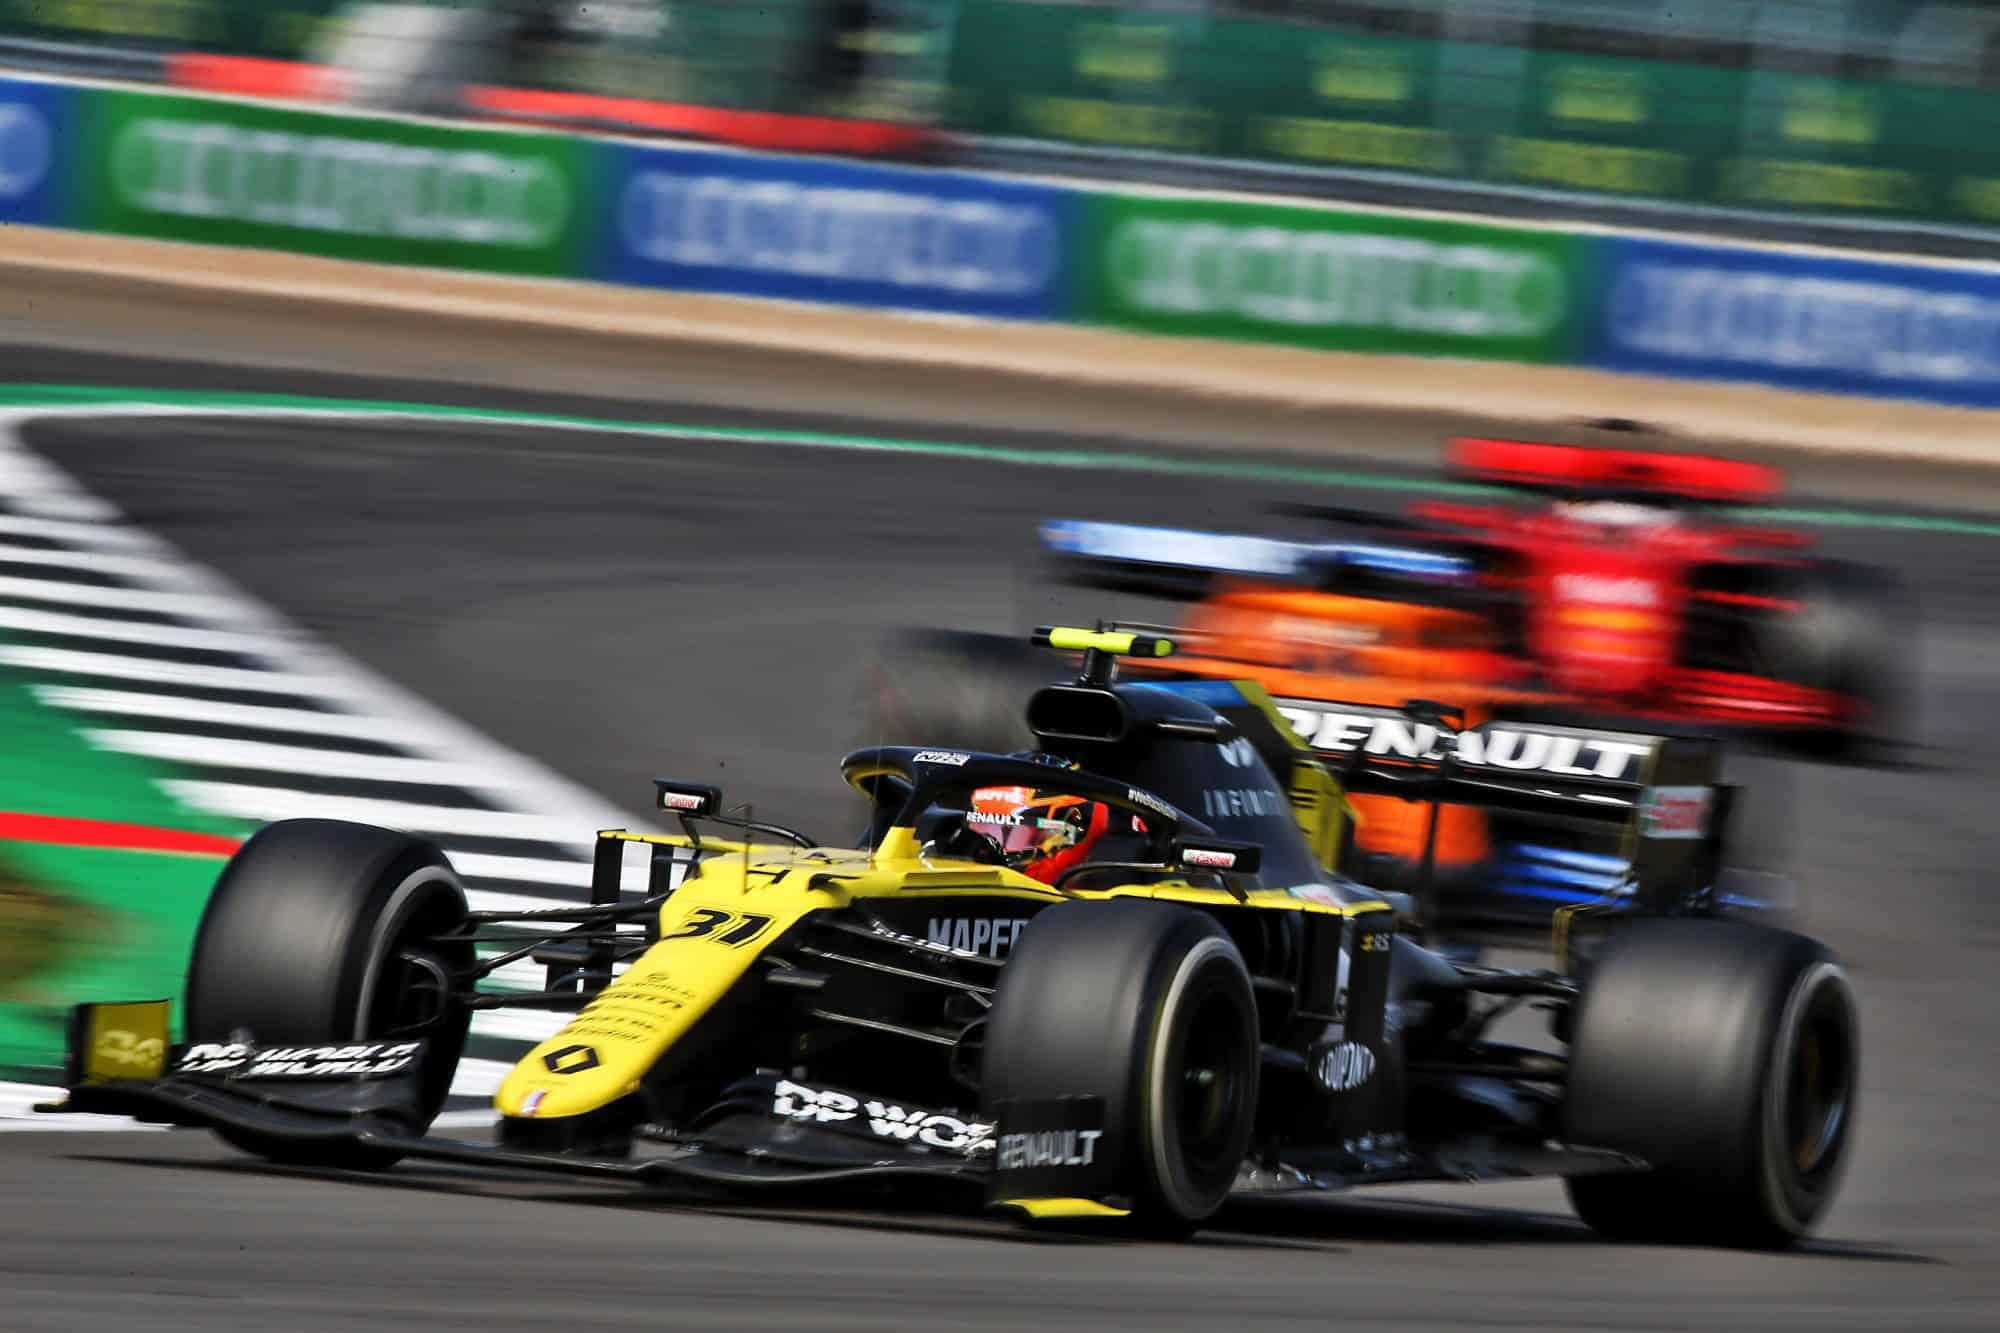 2020 70th Anniversary Ocon Renault Sunday race with Sainz and Vettel Photo Renault